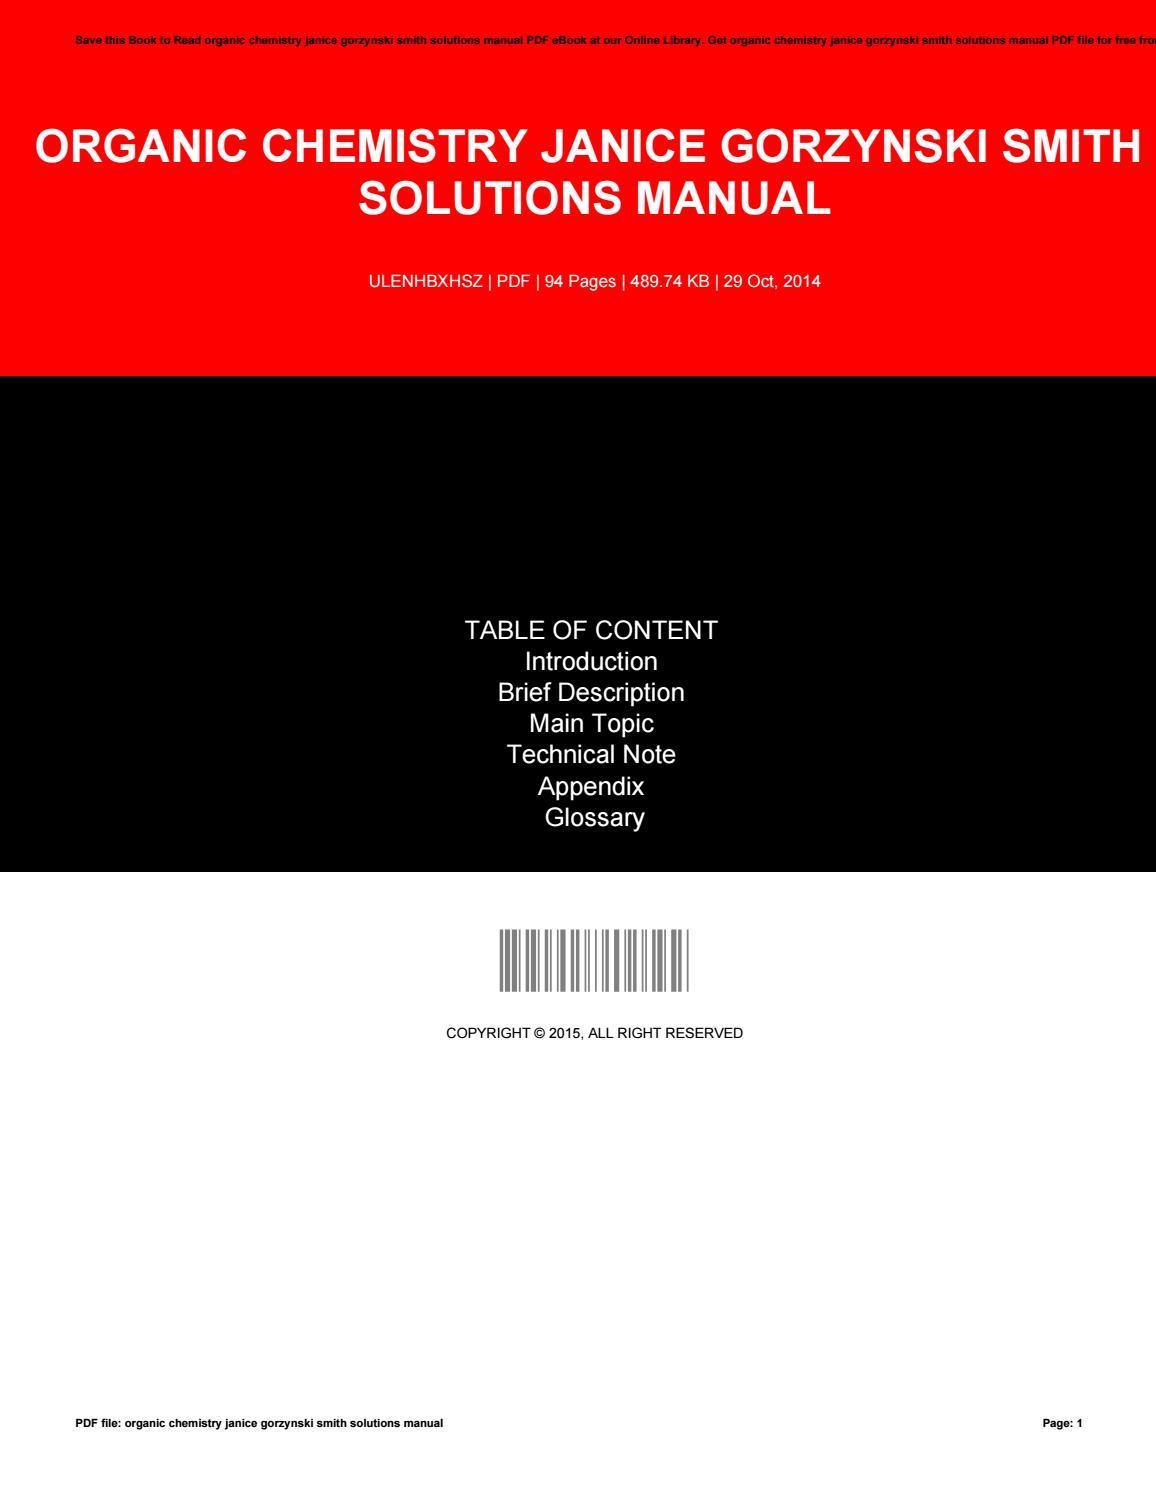 Organic chemistry janice gorzynski smith solutions manual by  ChristopherHuff3676 - issuu